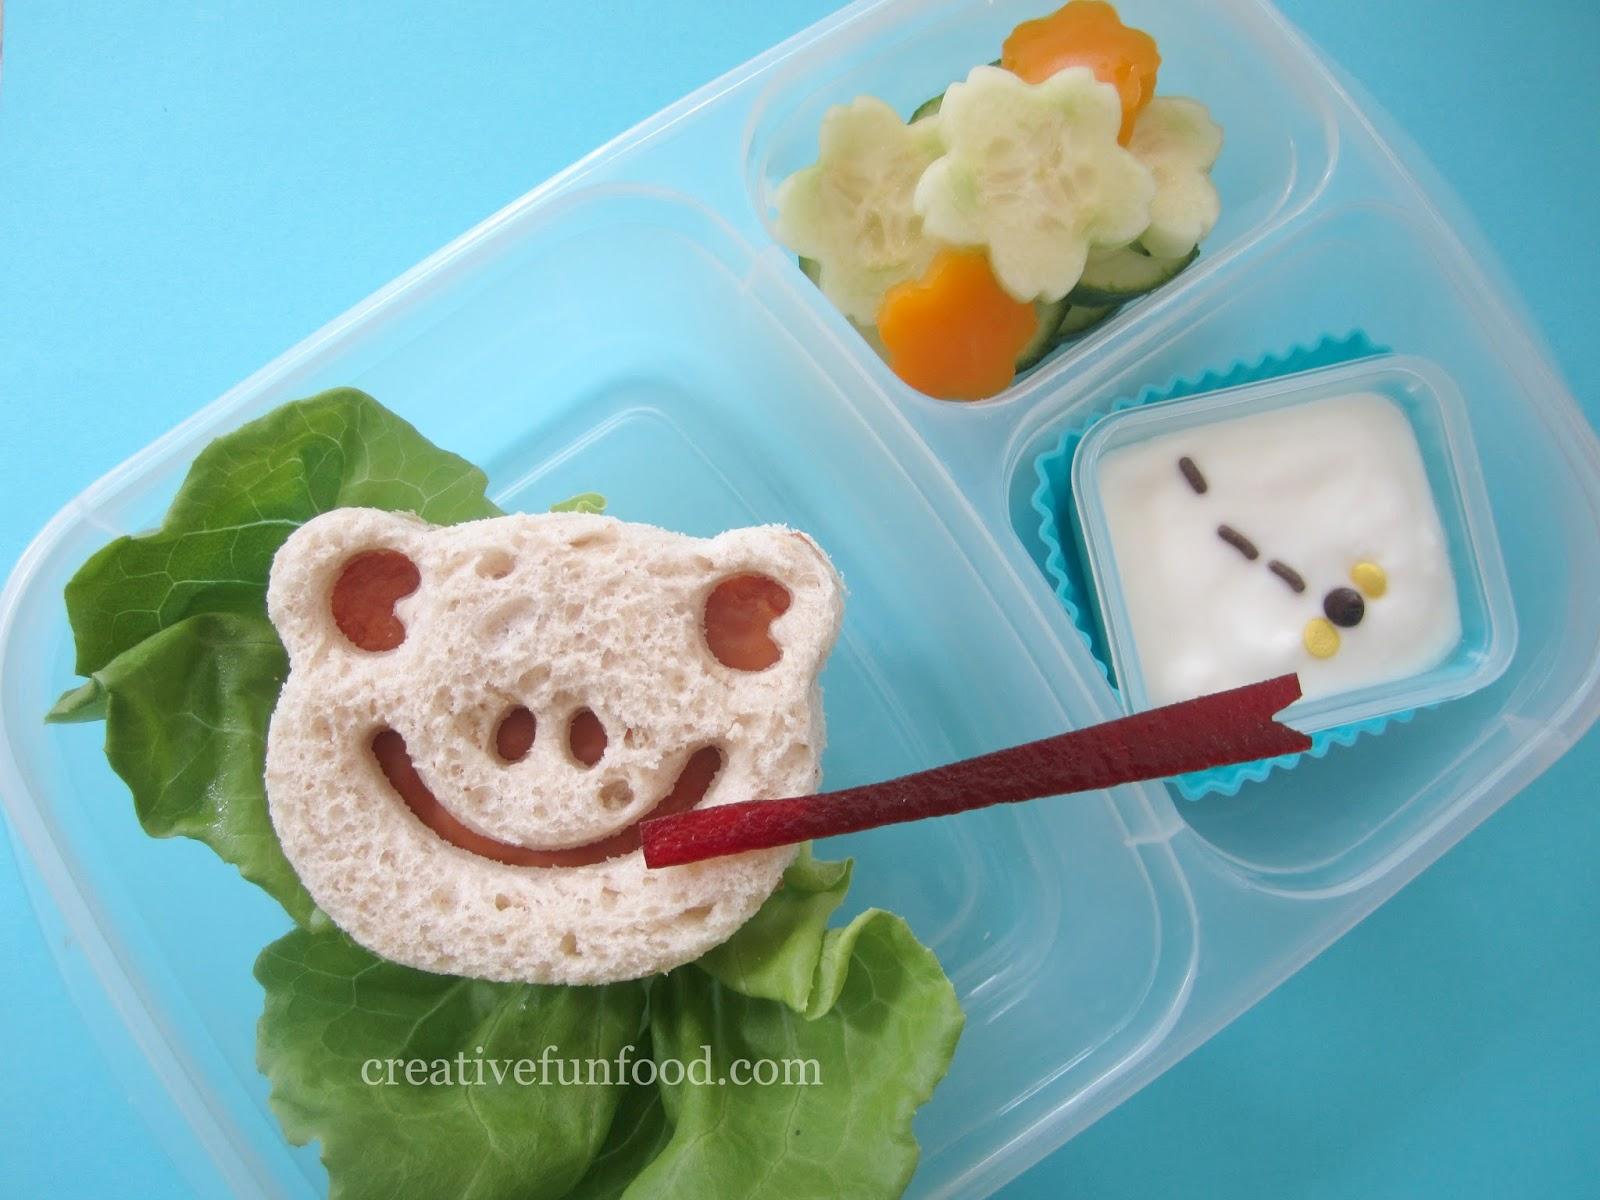 Creative Food: August 2013